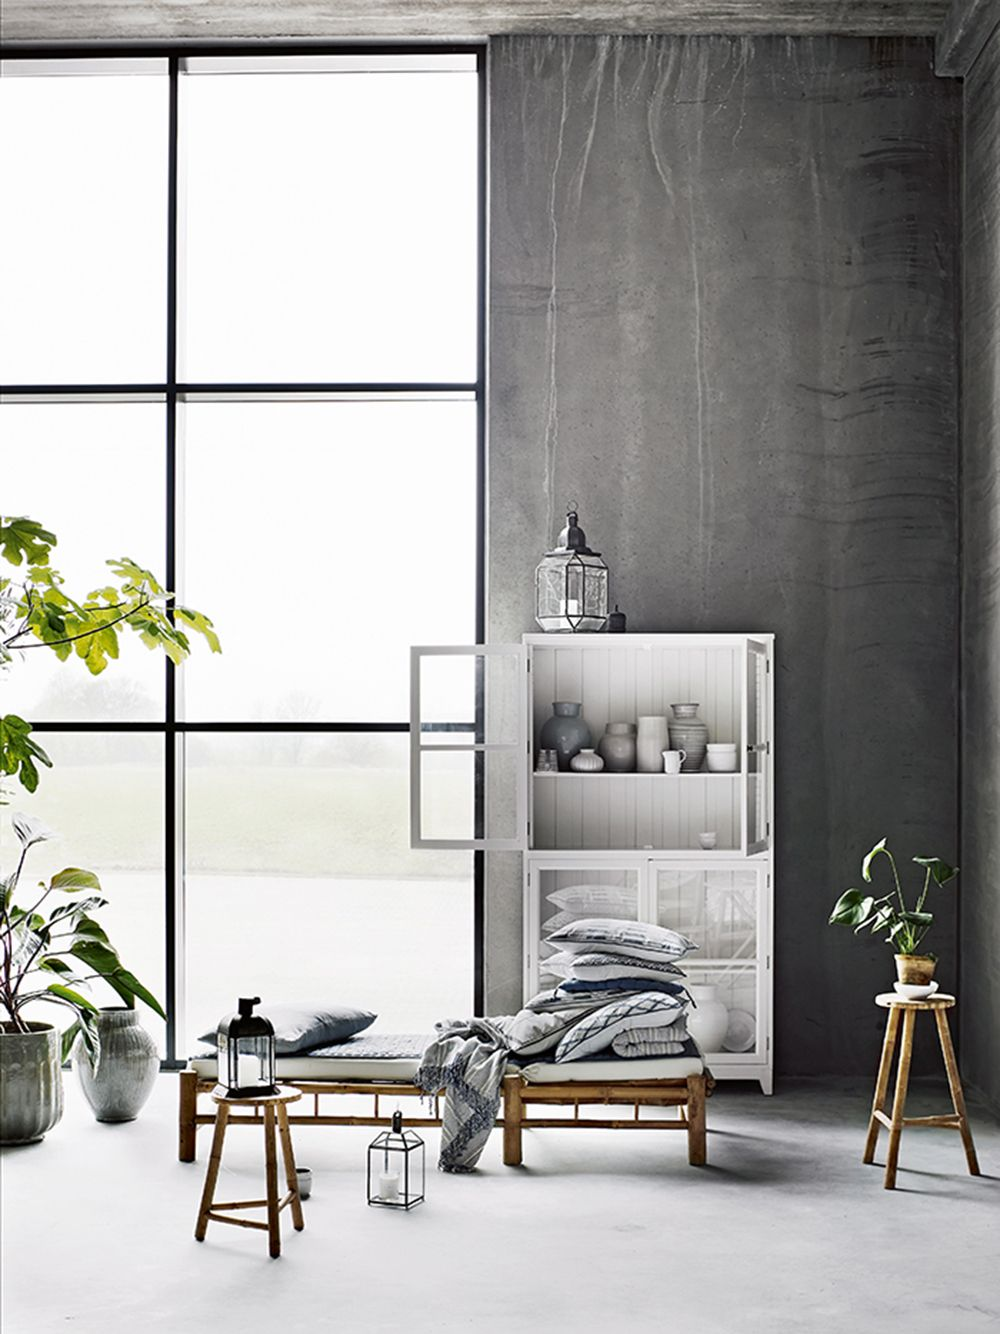 Interiors dna tine k home interior design secrets